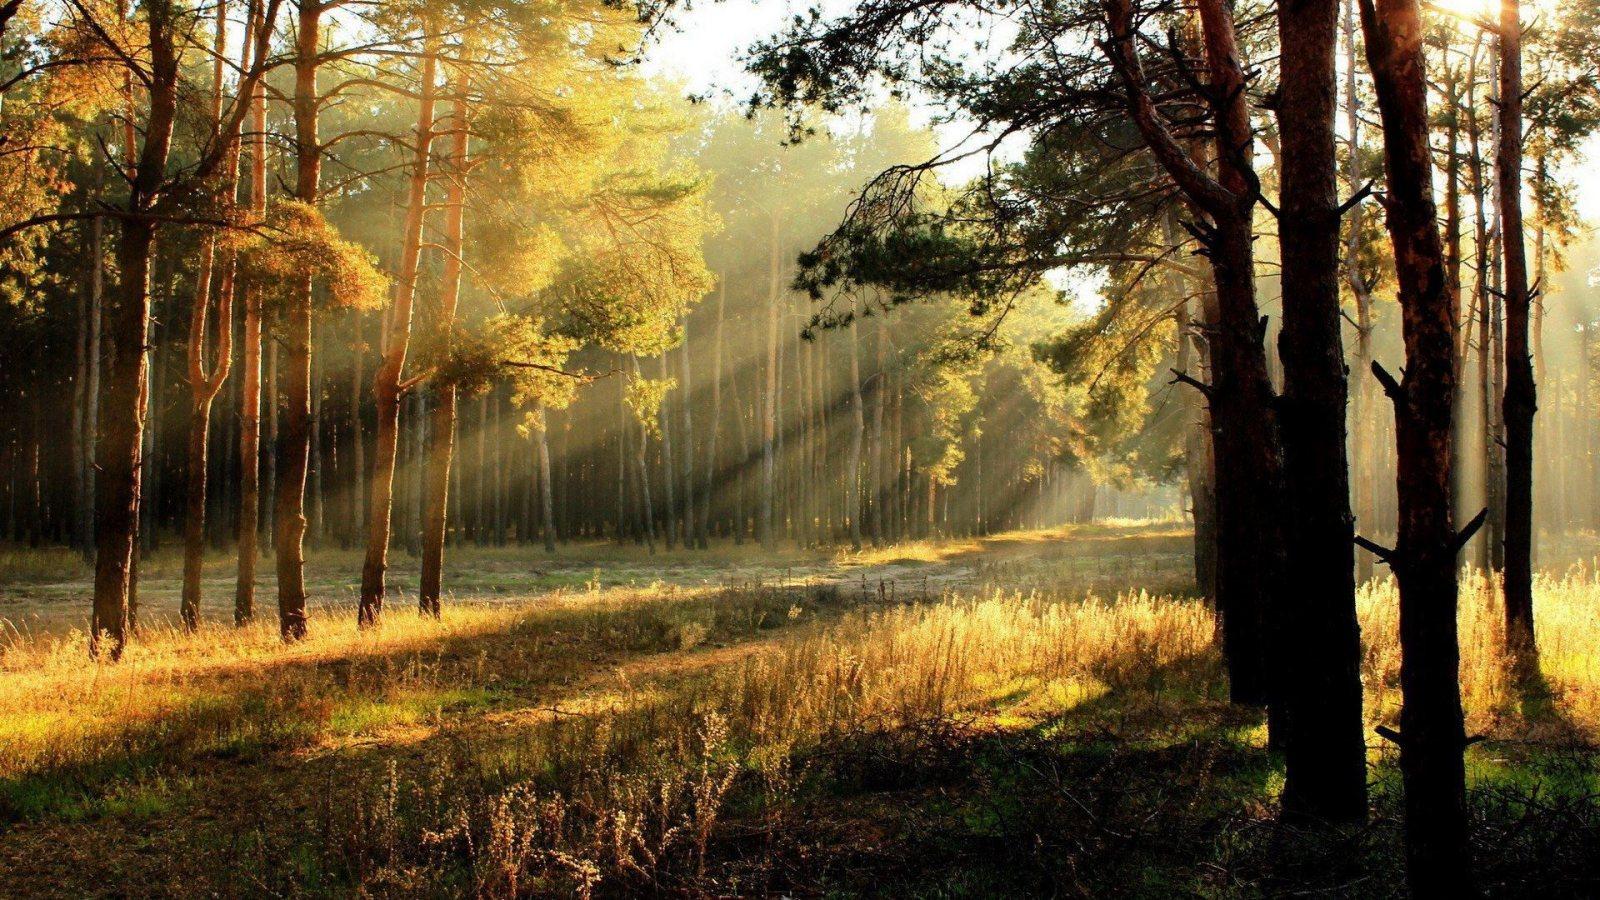 http://1.bp.blogspot.com/-MGL1tJ1cu7M/UGcW3wYaIdI/AAAAAAAAHJU/krdCFrPsxhA/s1600/sun-rays-through-forest-trees-1600x900.jpg